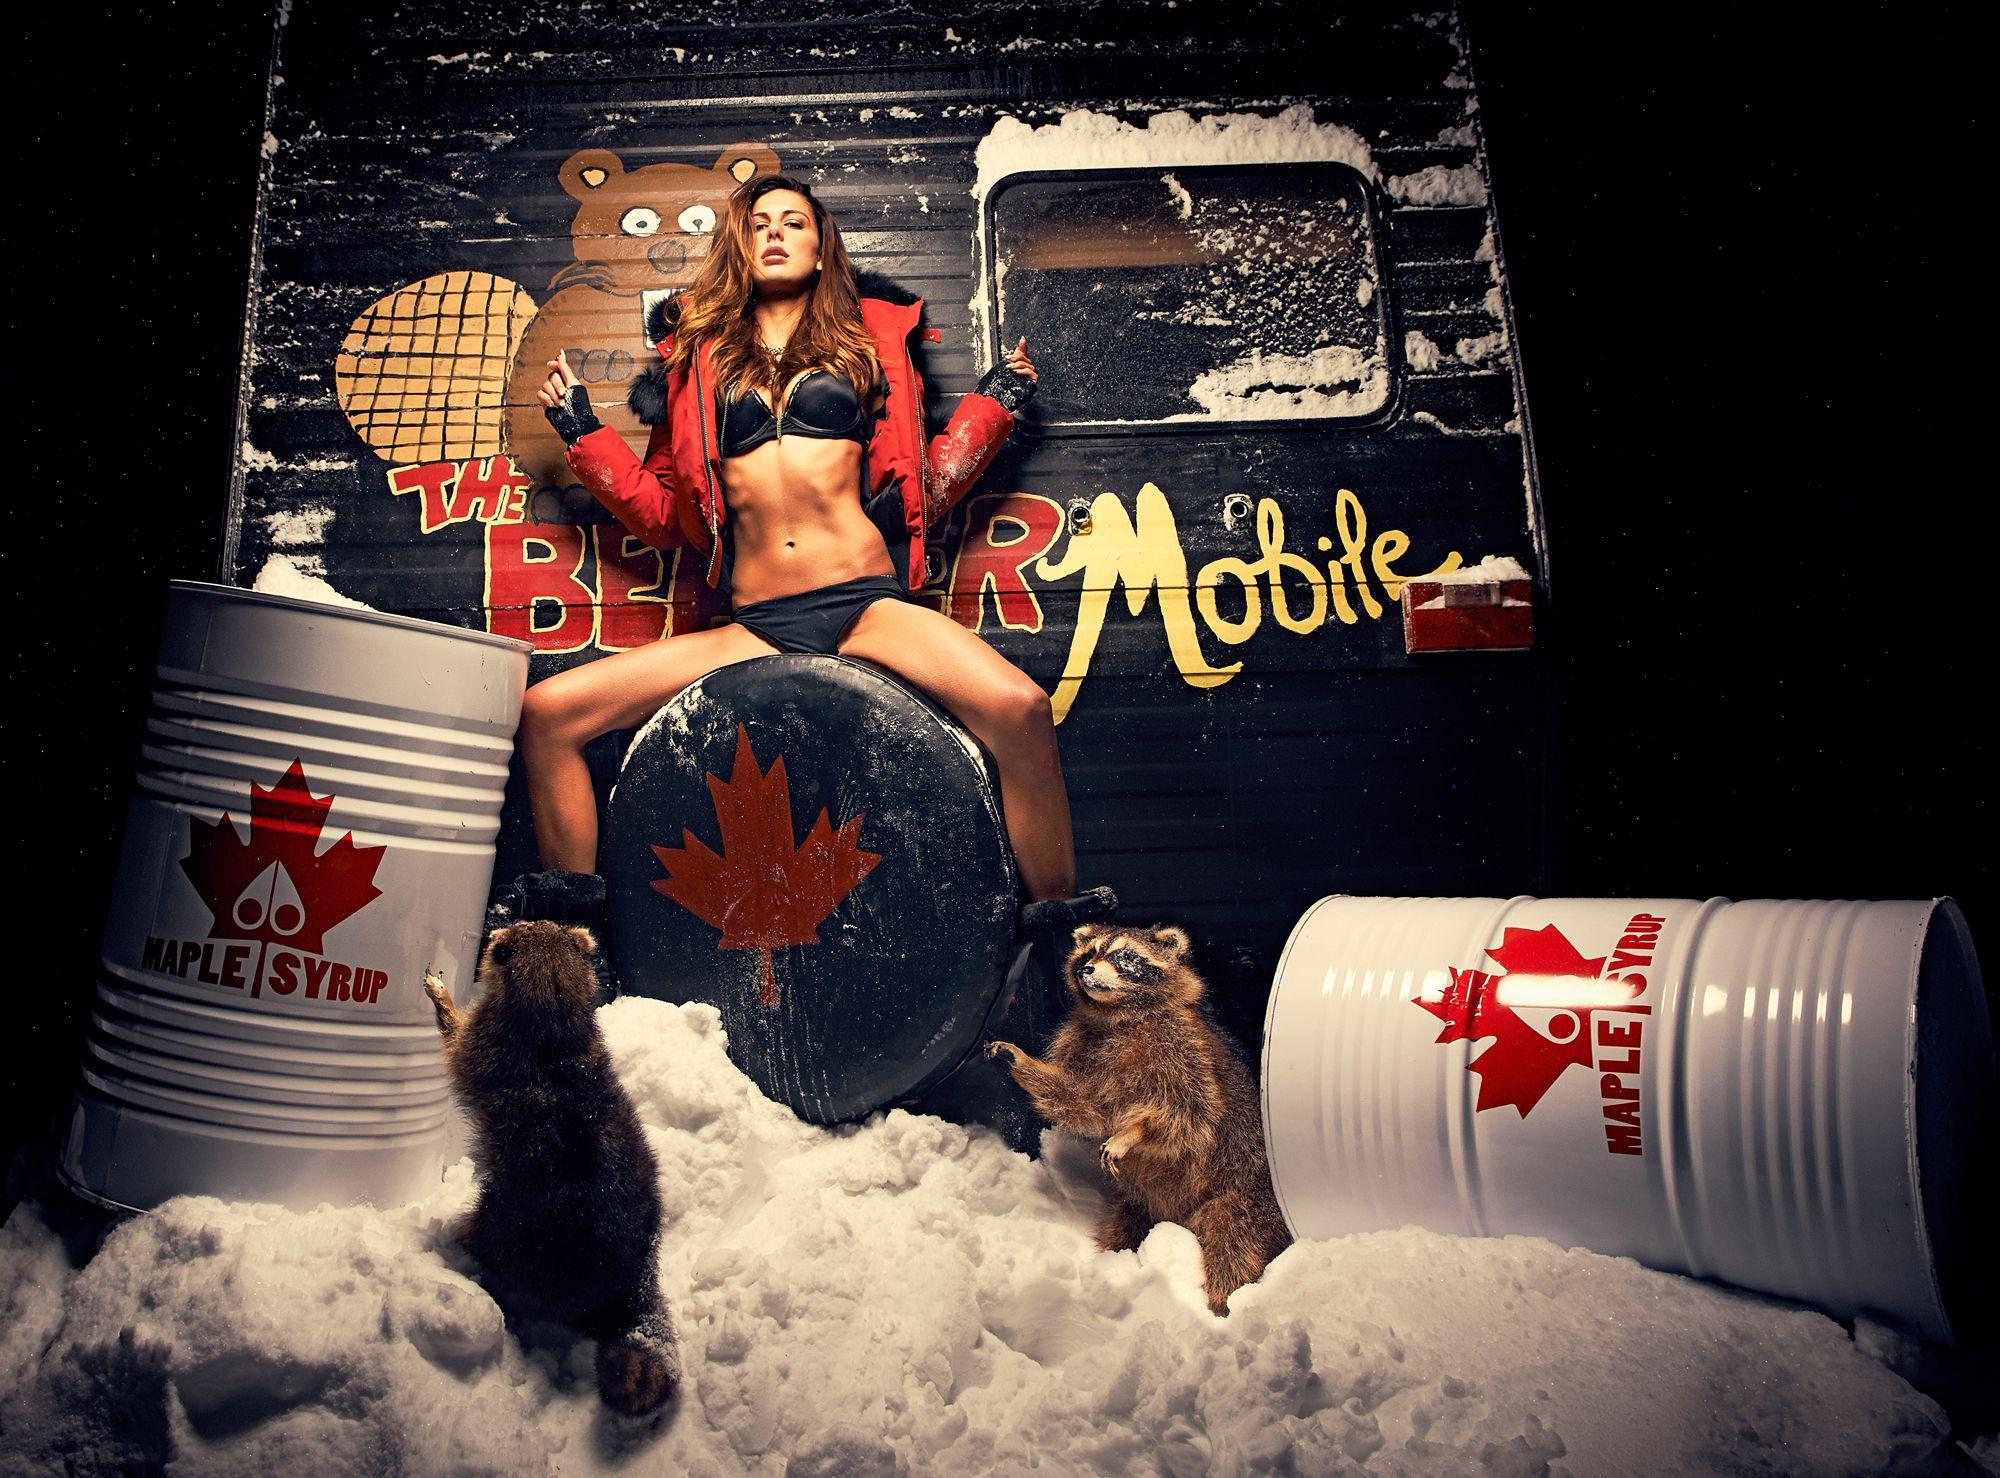 HW14-15 collectie Moose Knuckles